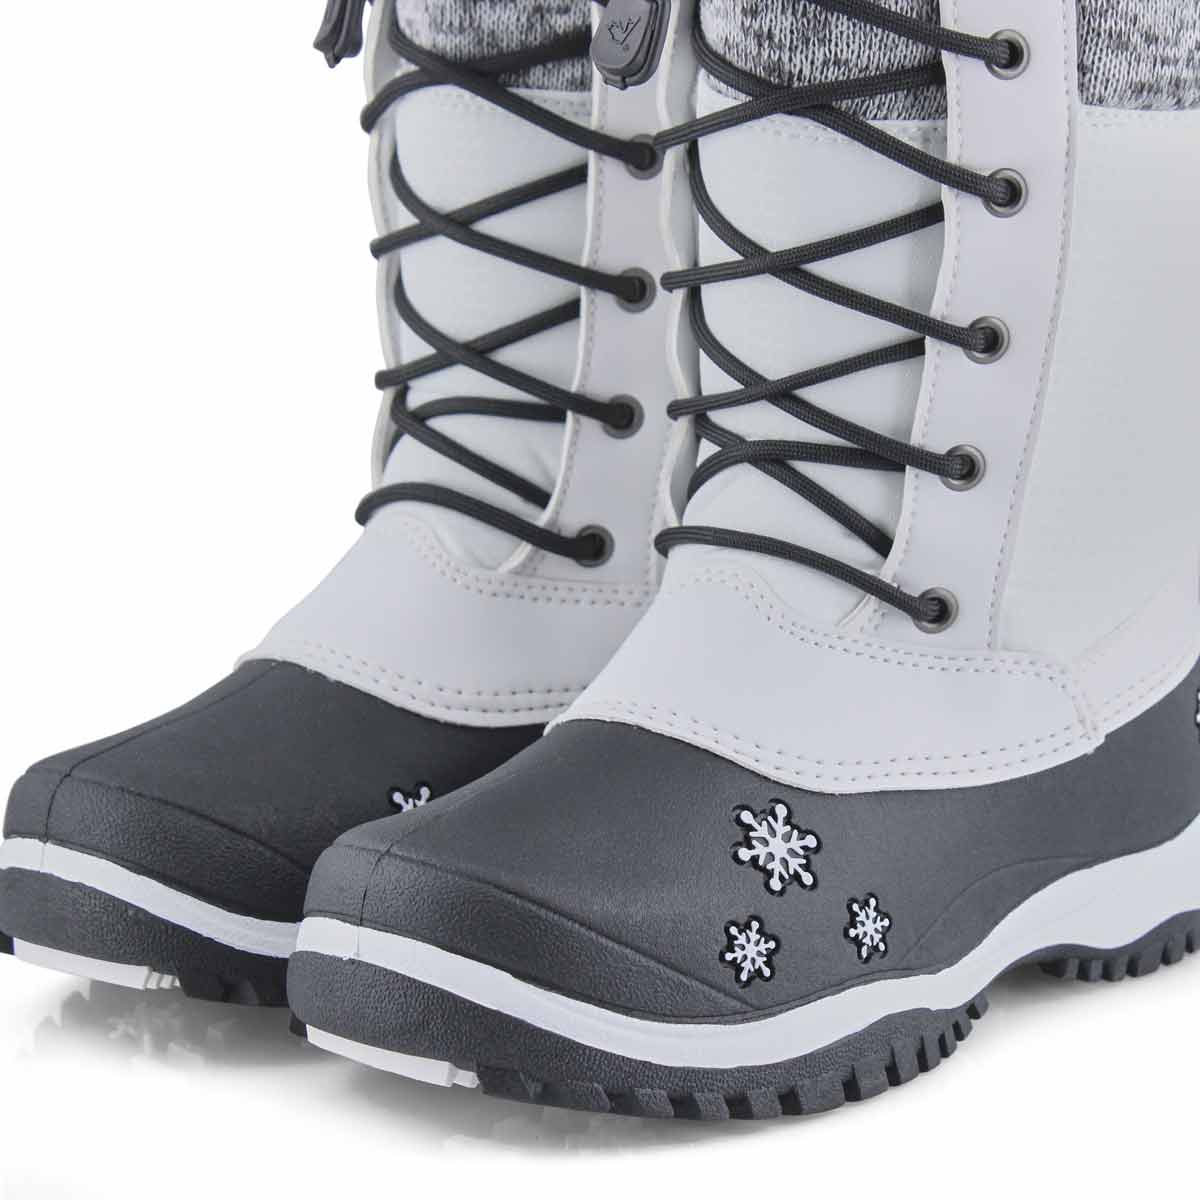 Girls' AVERY white waterproof winter boots